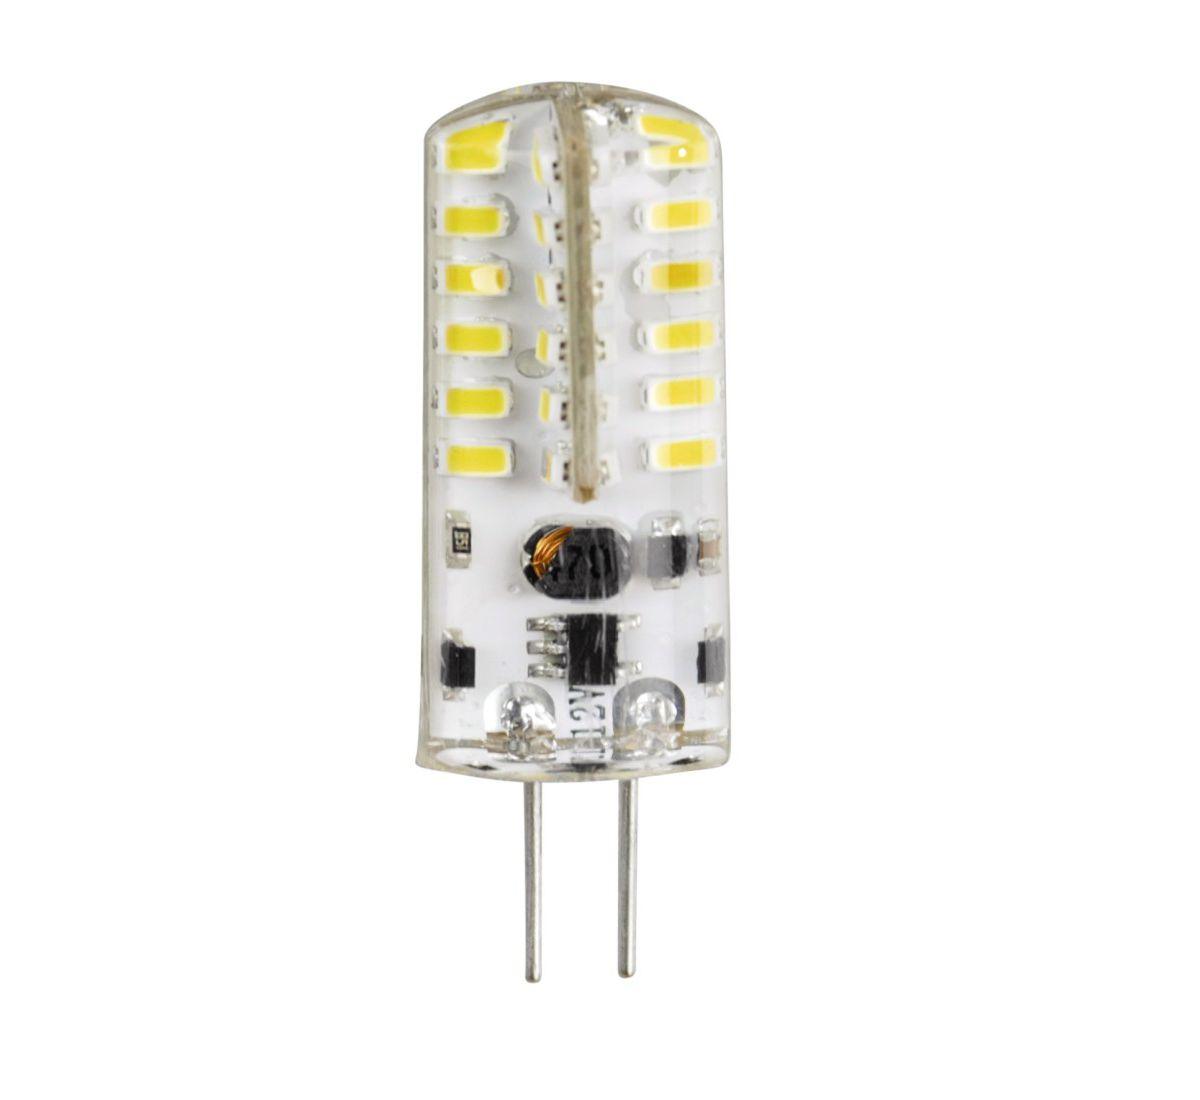 Xavax LED-Lampe, G4, 180lm ersetzt 19W Stiftsoc...